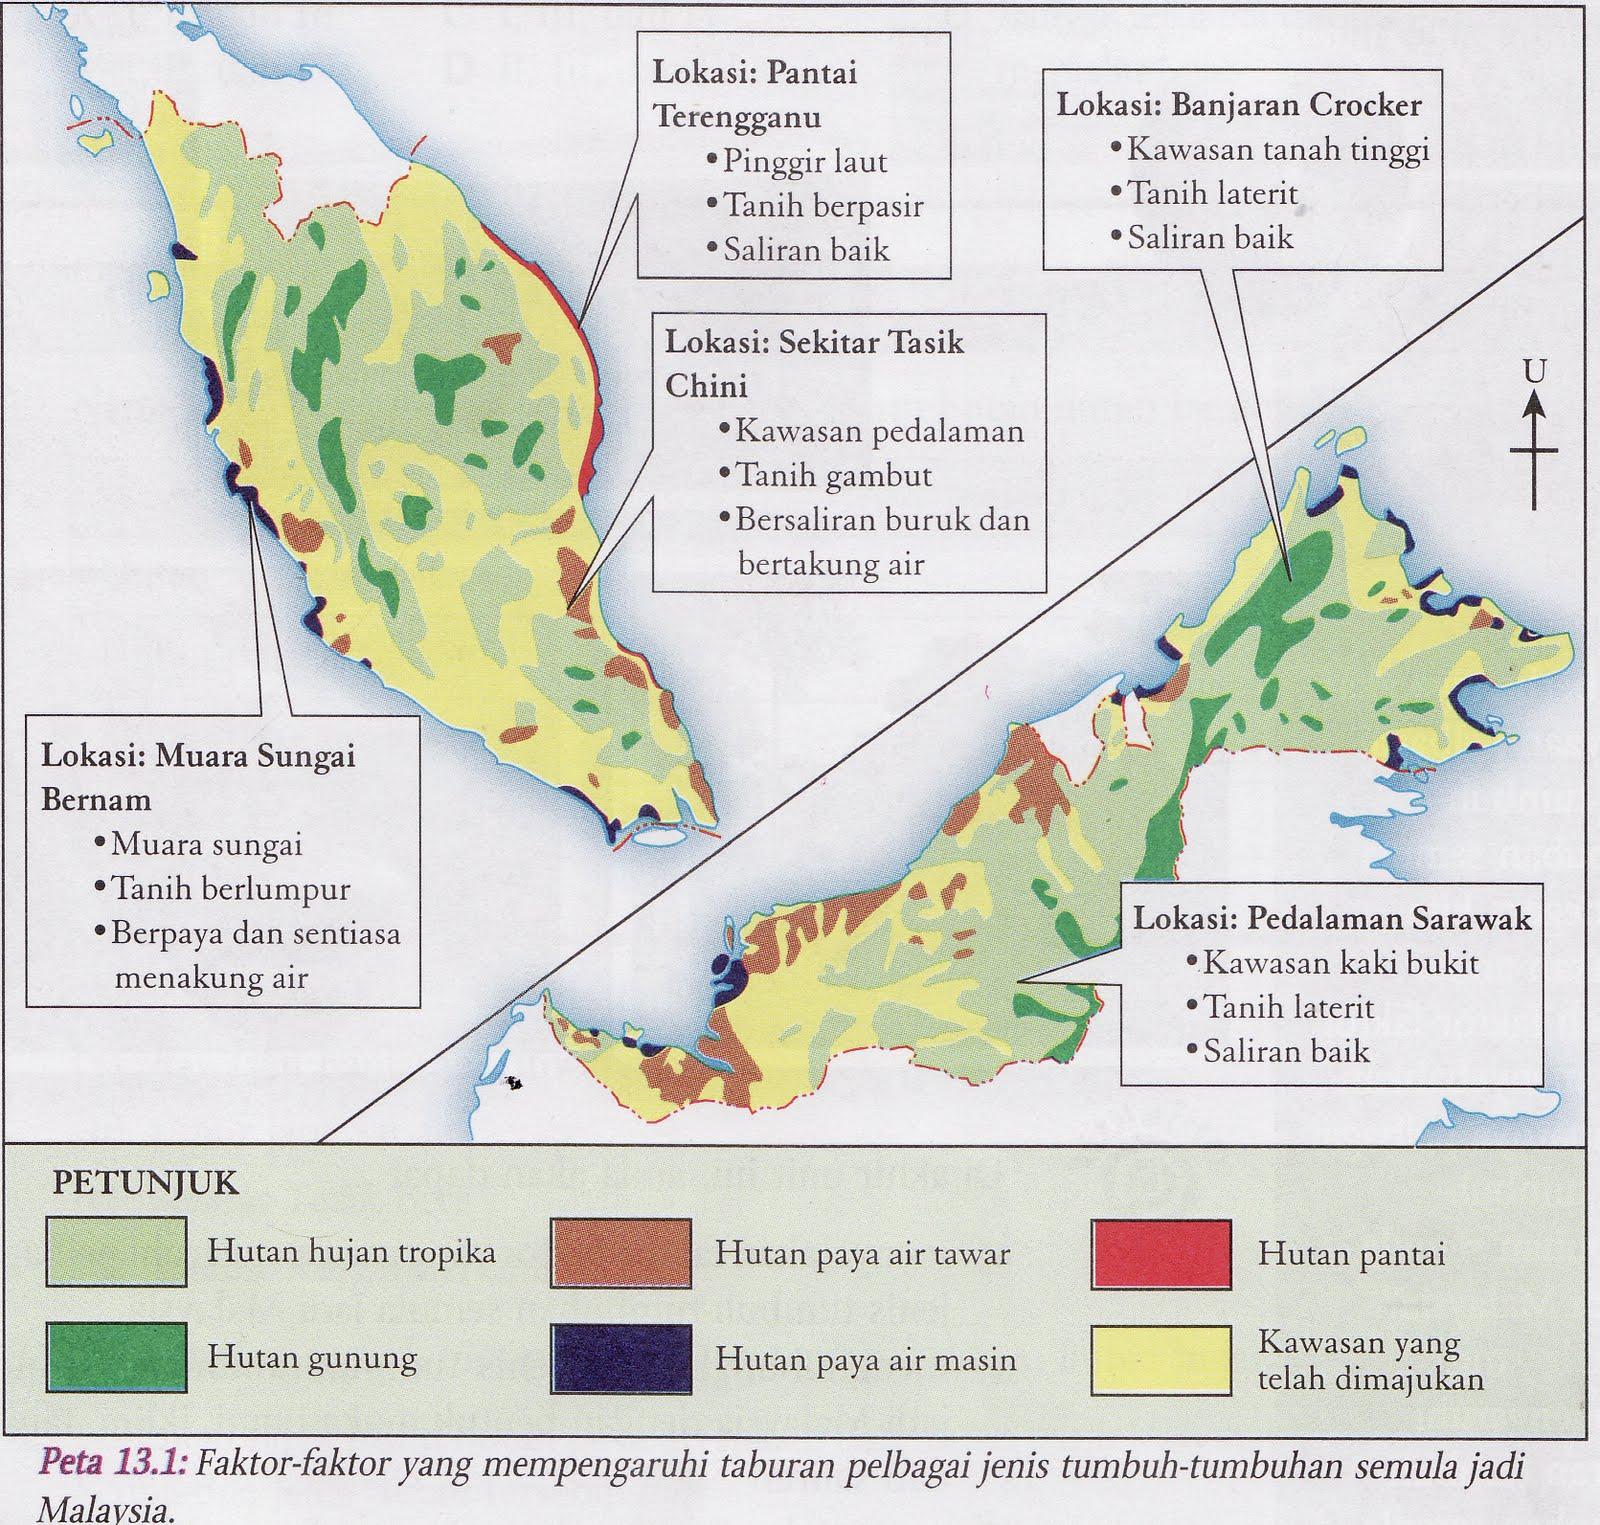 Tinta Tinta Ilmu Hutan Hujan Tropika